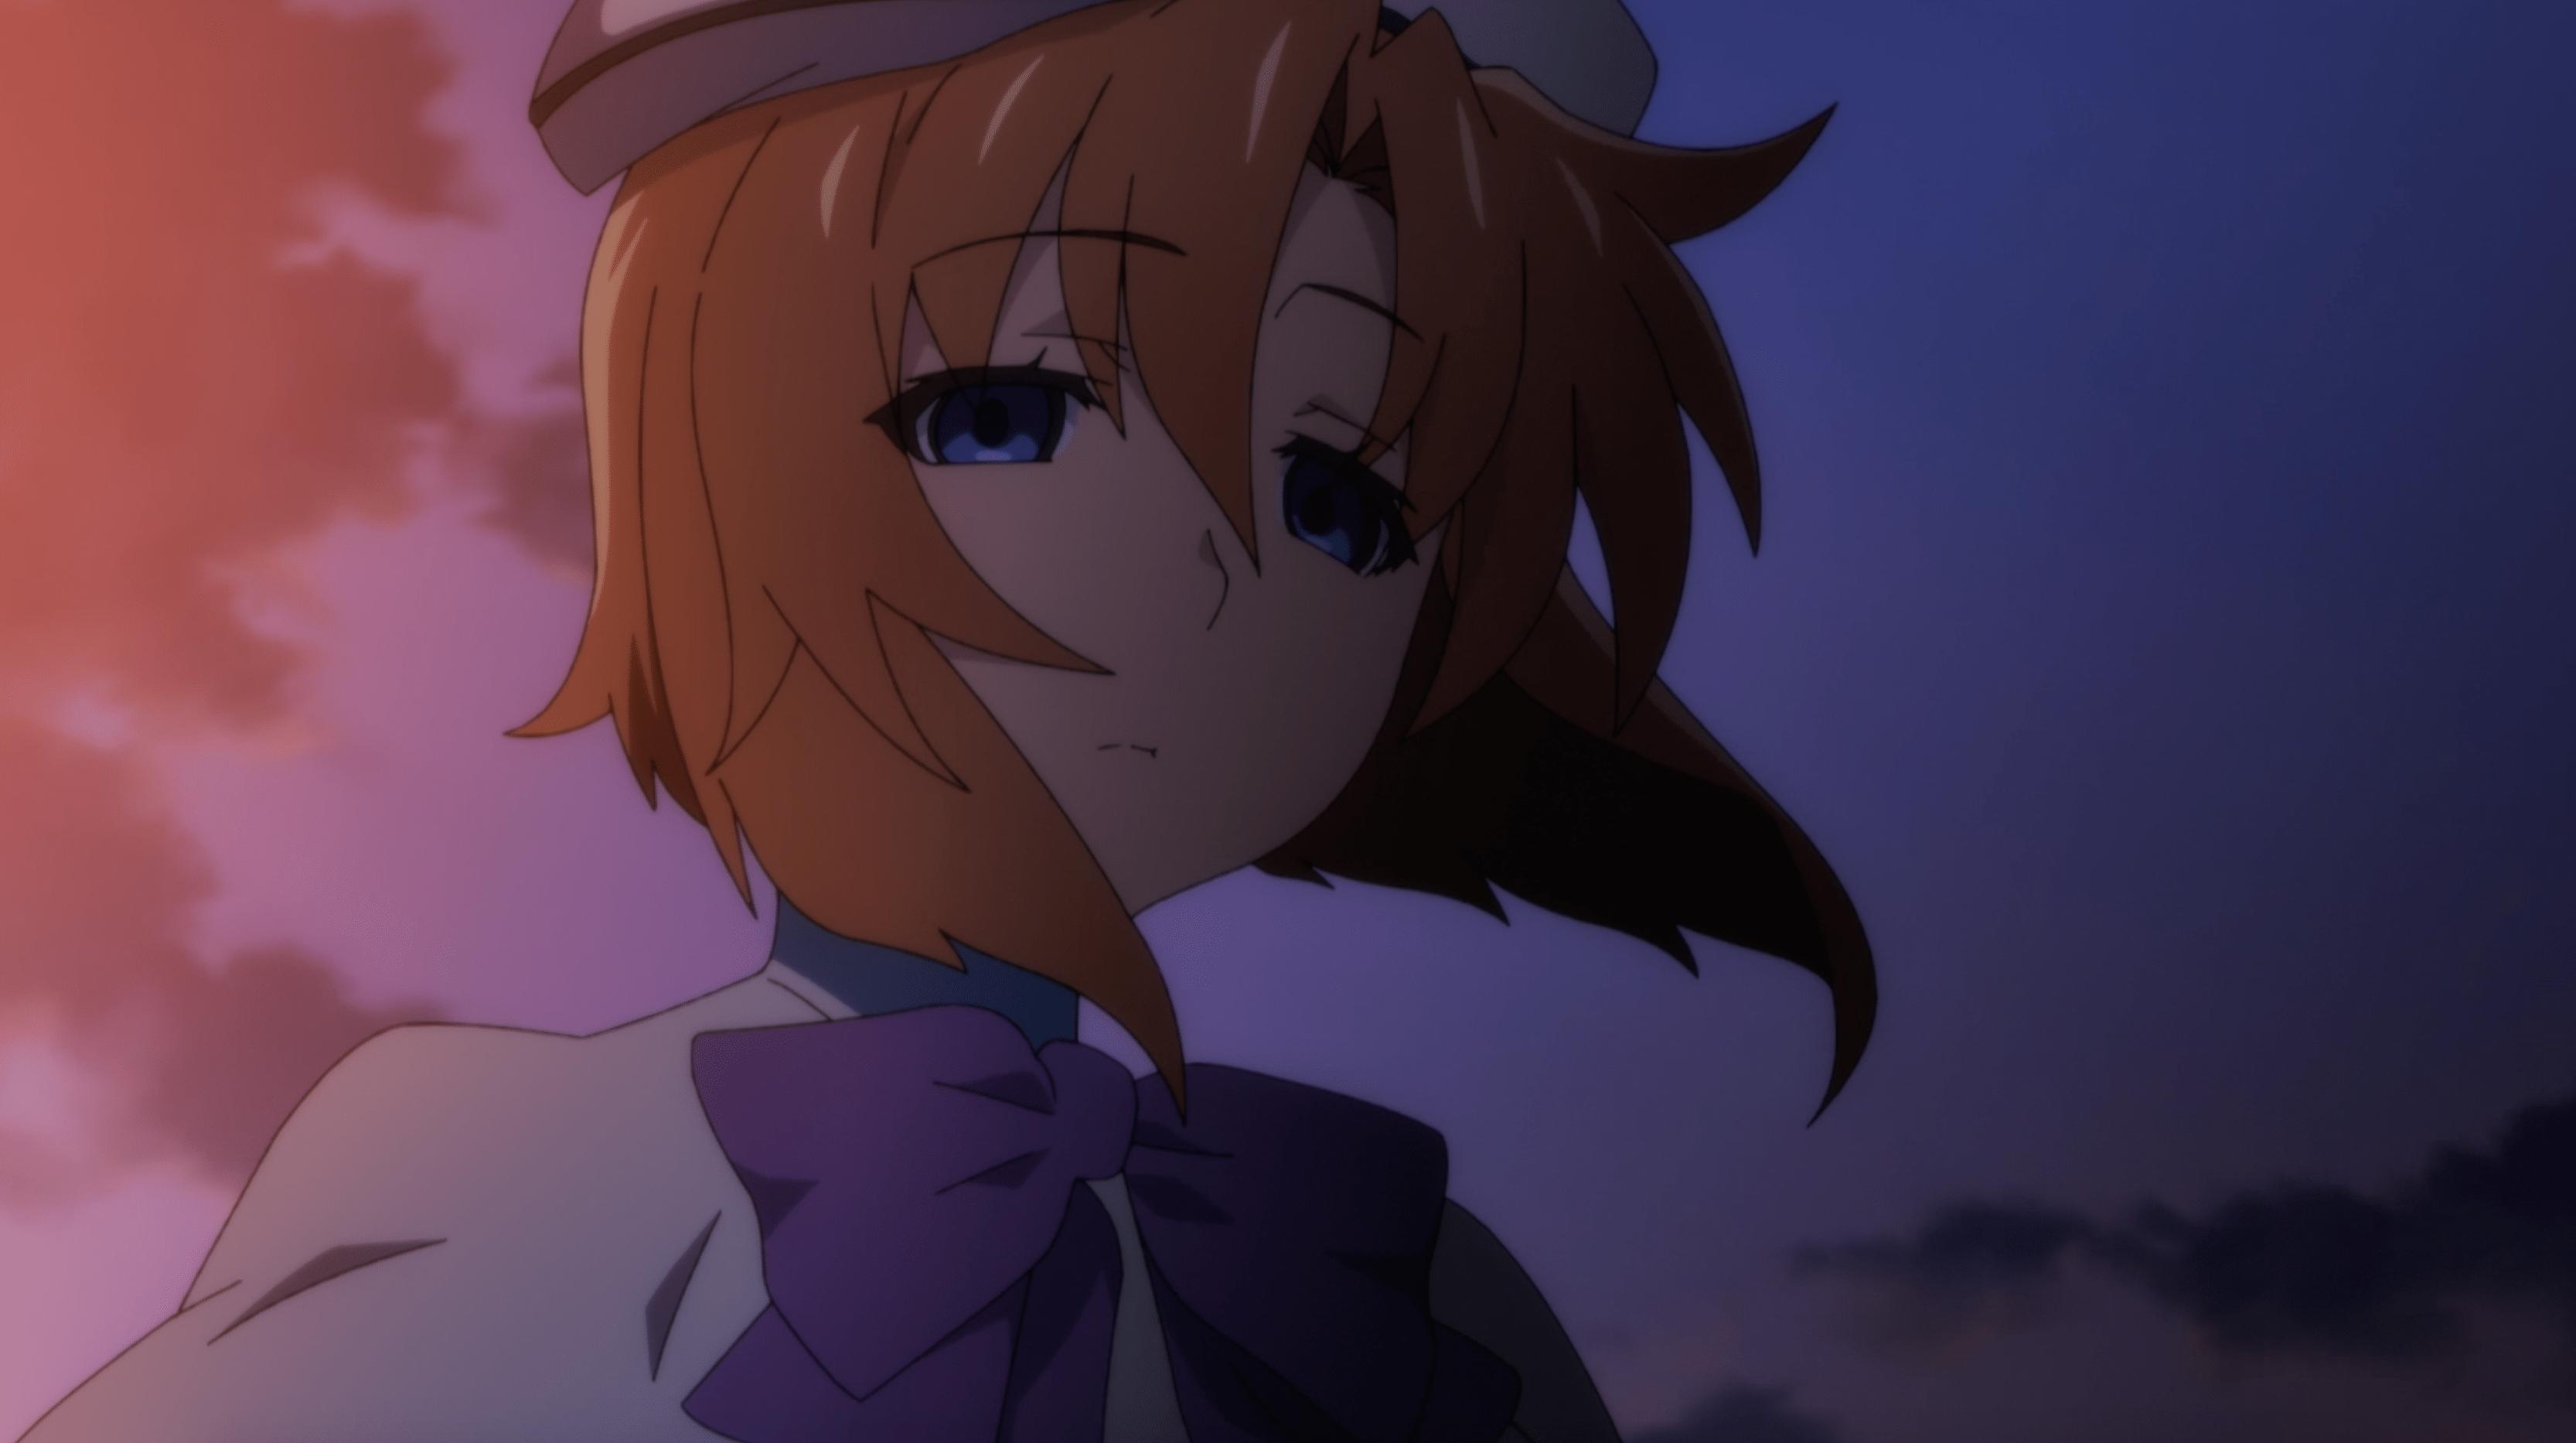 Higurashi - When They Cry